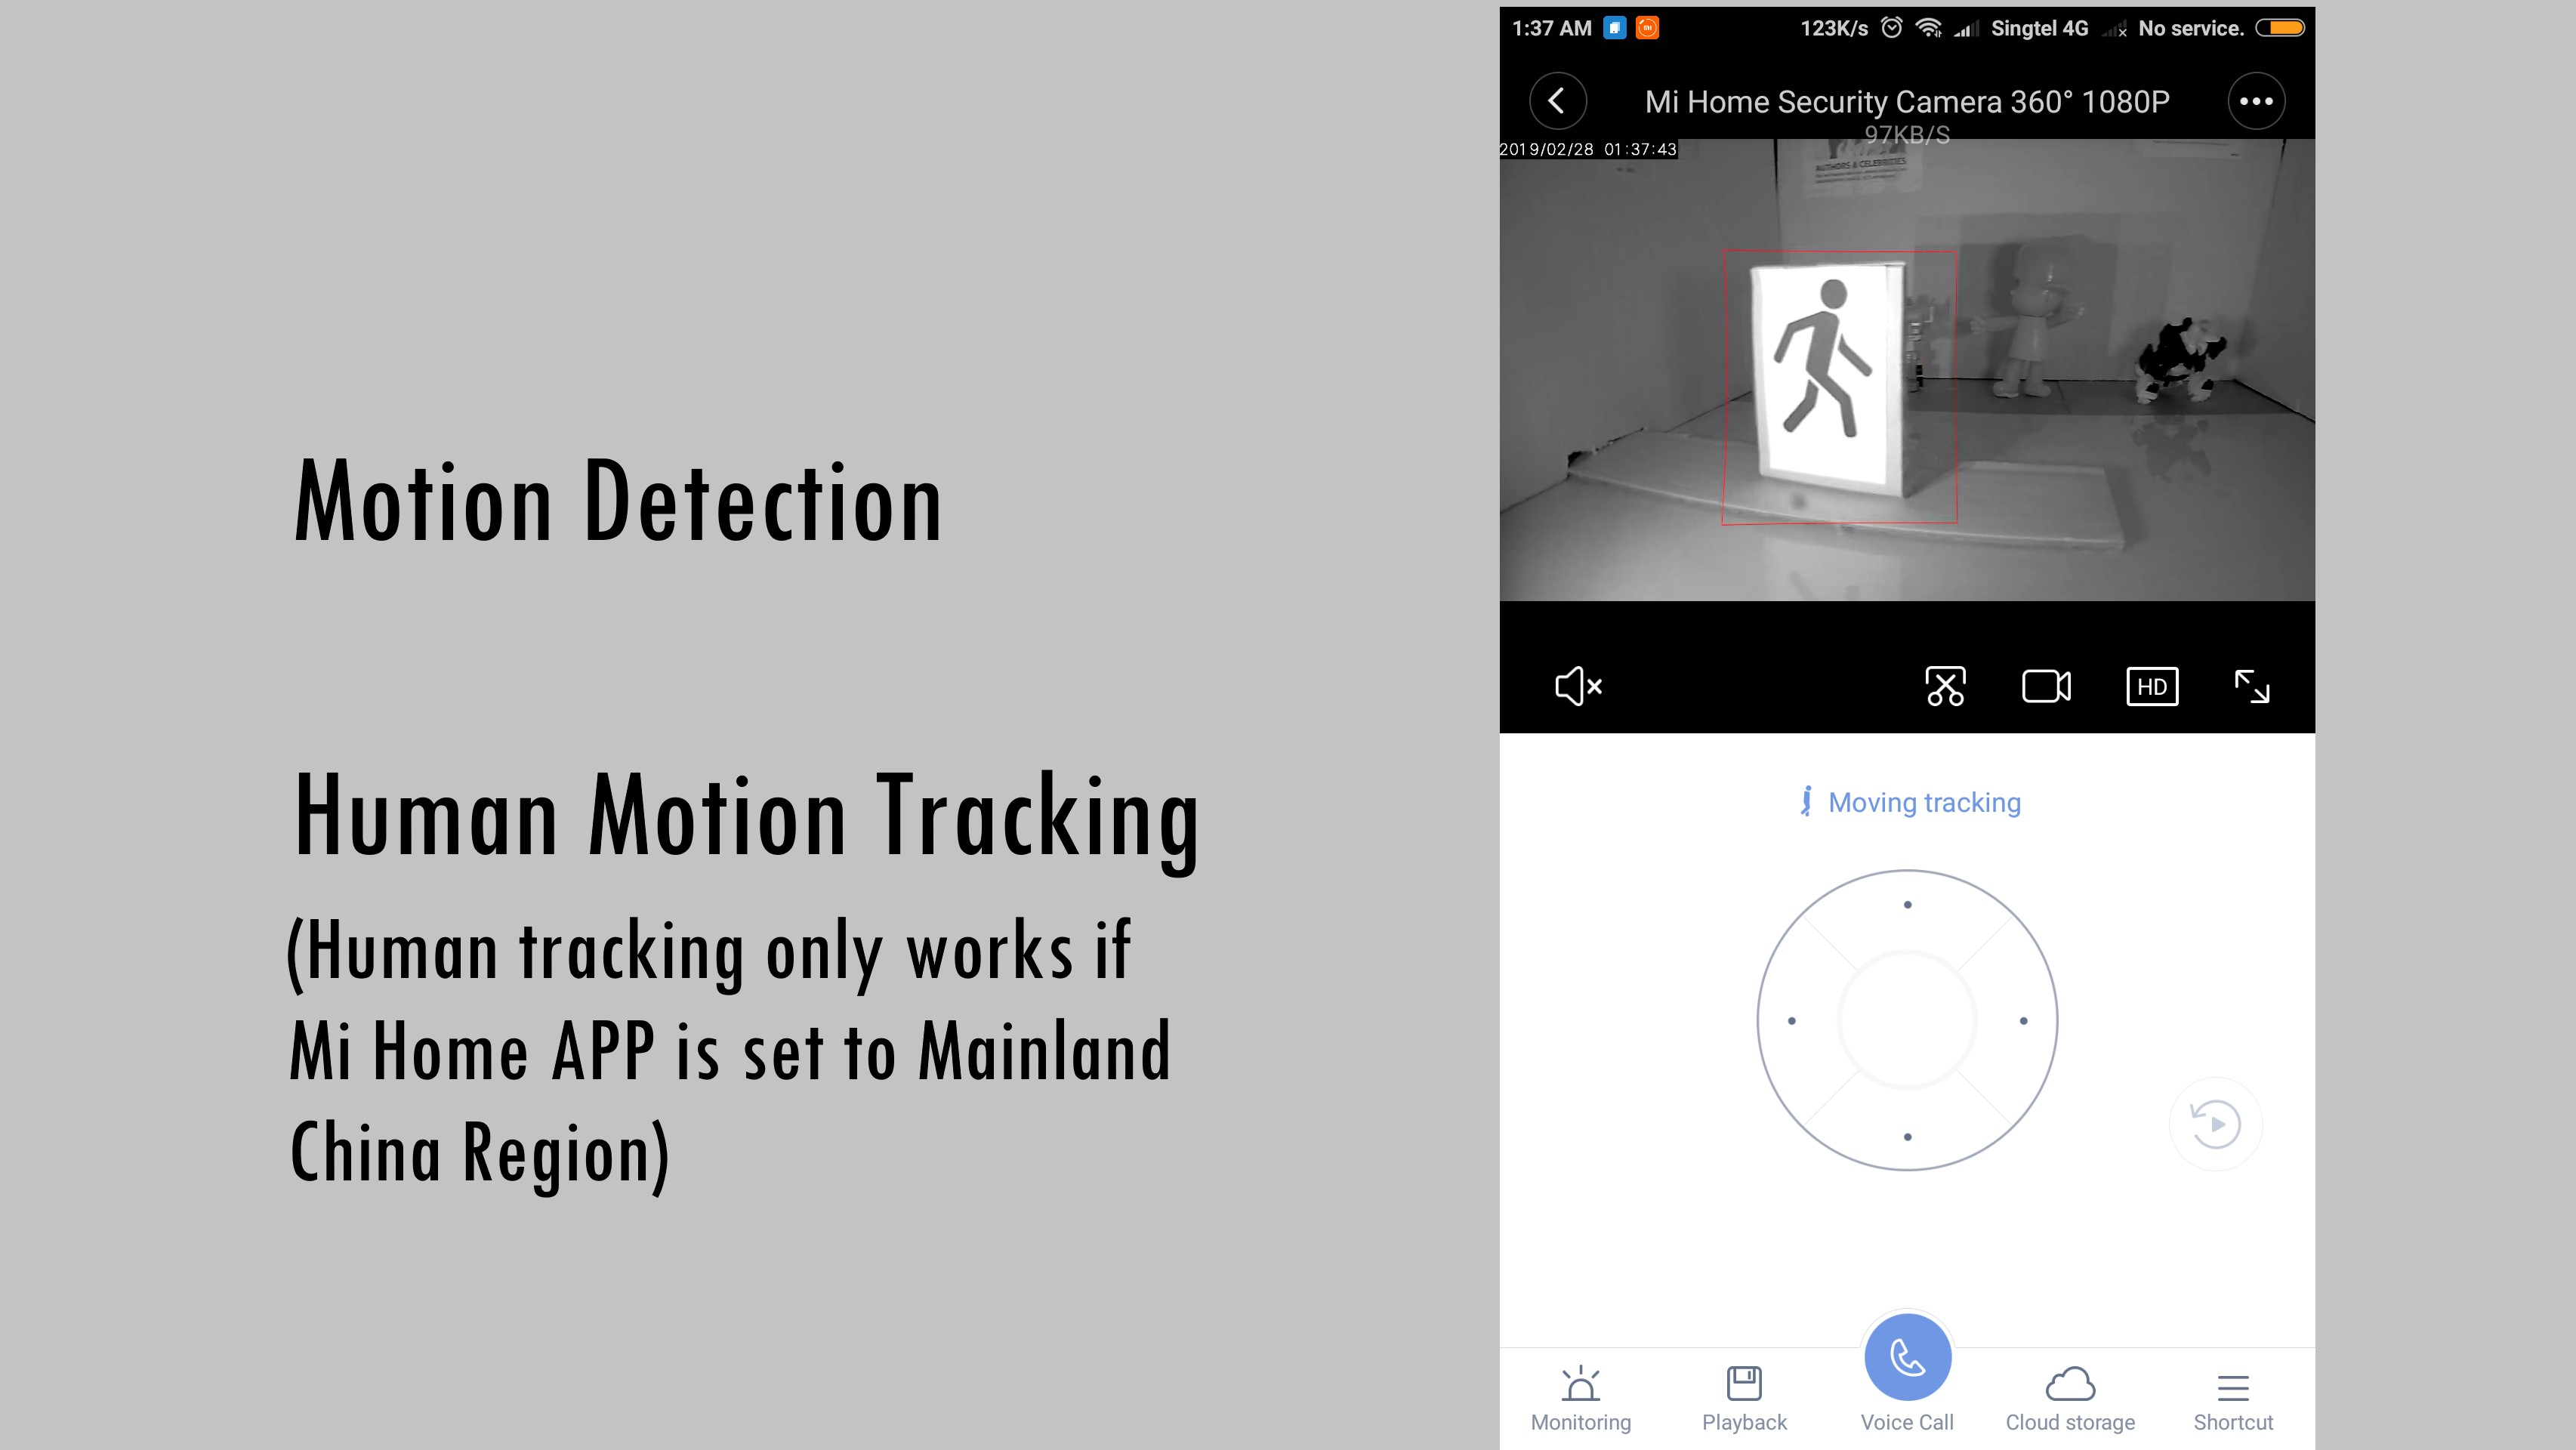 Xiaomi Mi Home Mijia Security Camera 360 Degrees View 1080P Wi-Fi Night  Vision Motion Detection Audio Video Recording Voice Intercom by Mojo